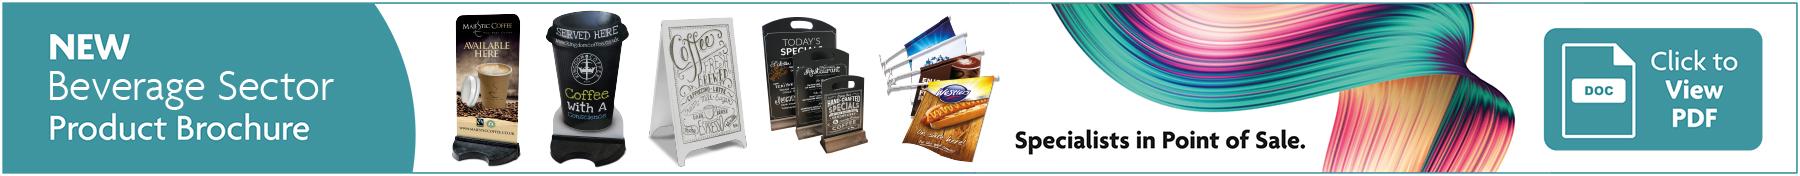 Coffee Marketing POS Brochure